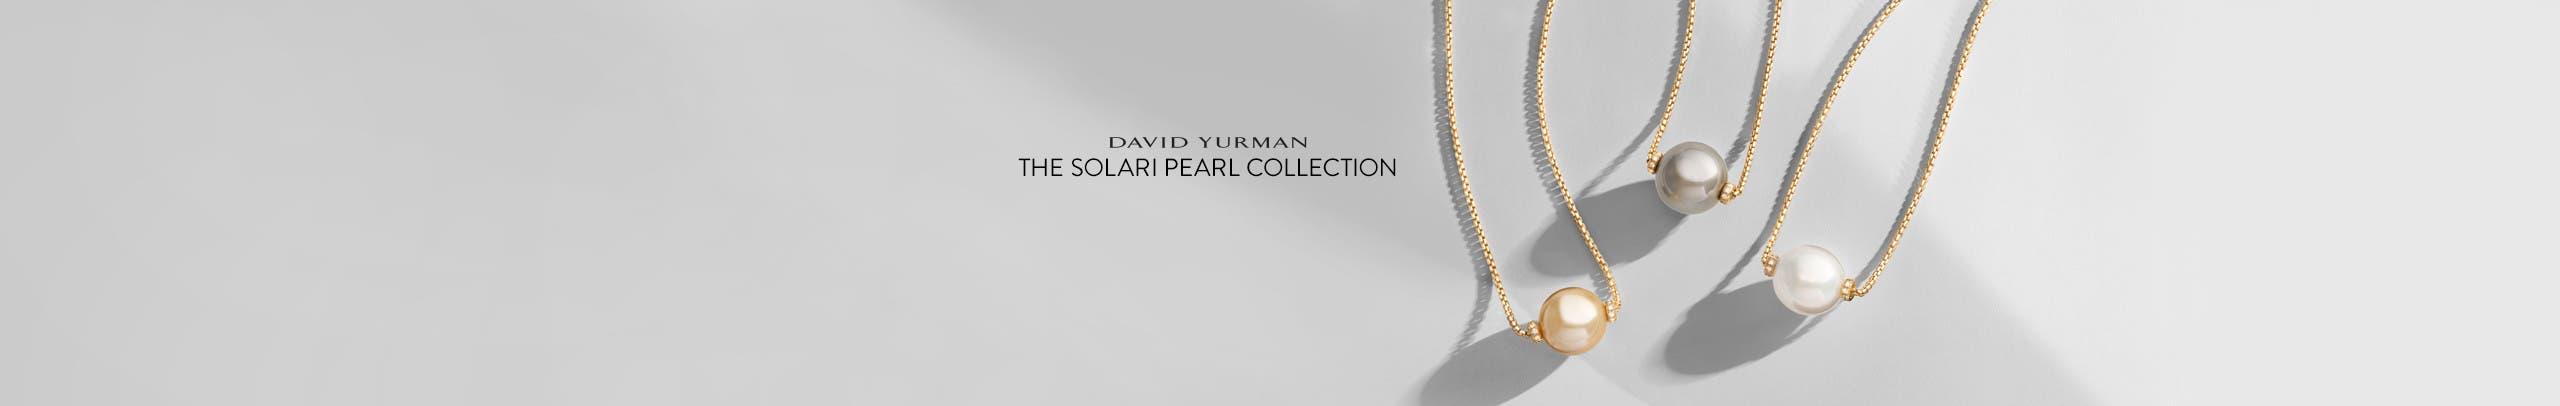 David Yurman: The Solari Pearl Collection.